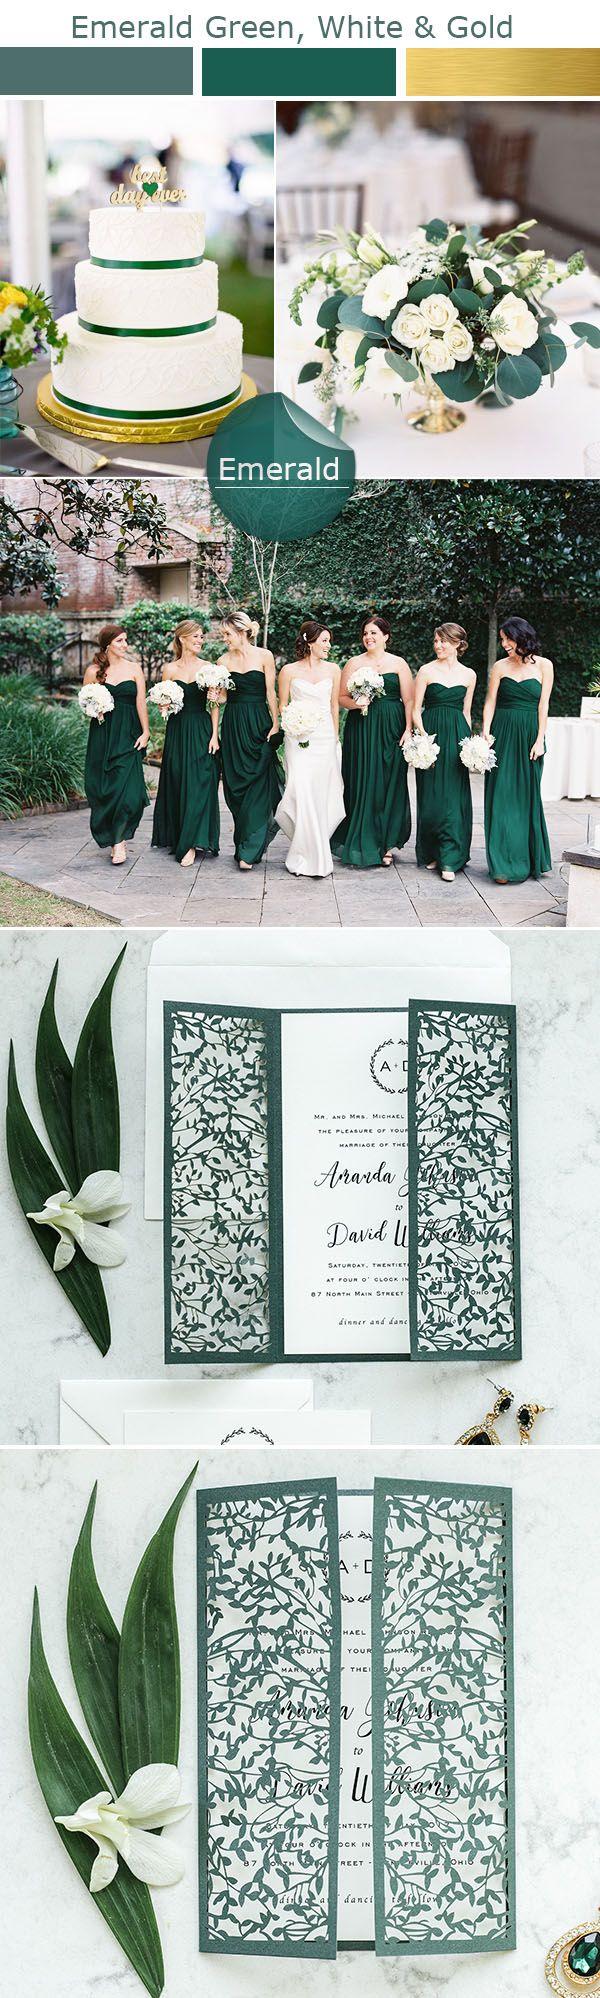 Delicate emerald laser cut wedding invitations